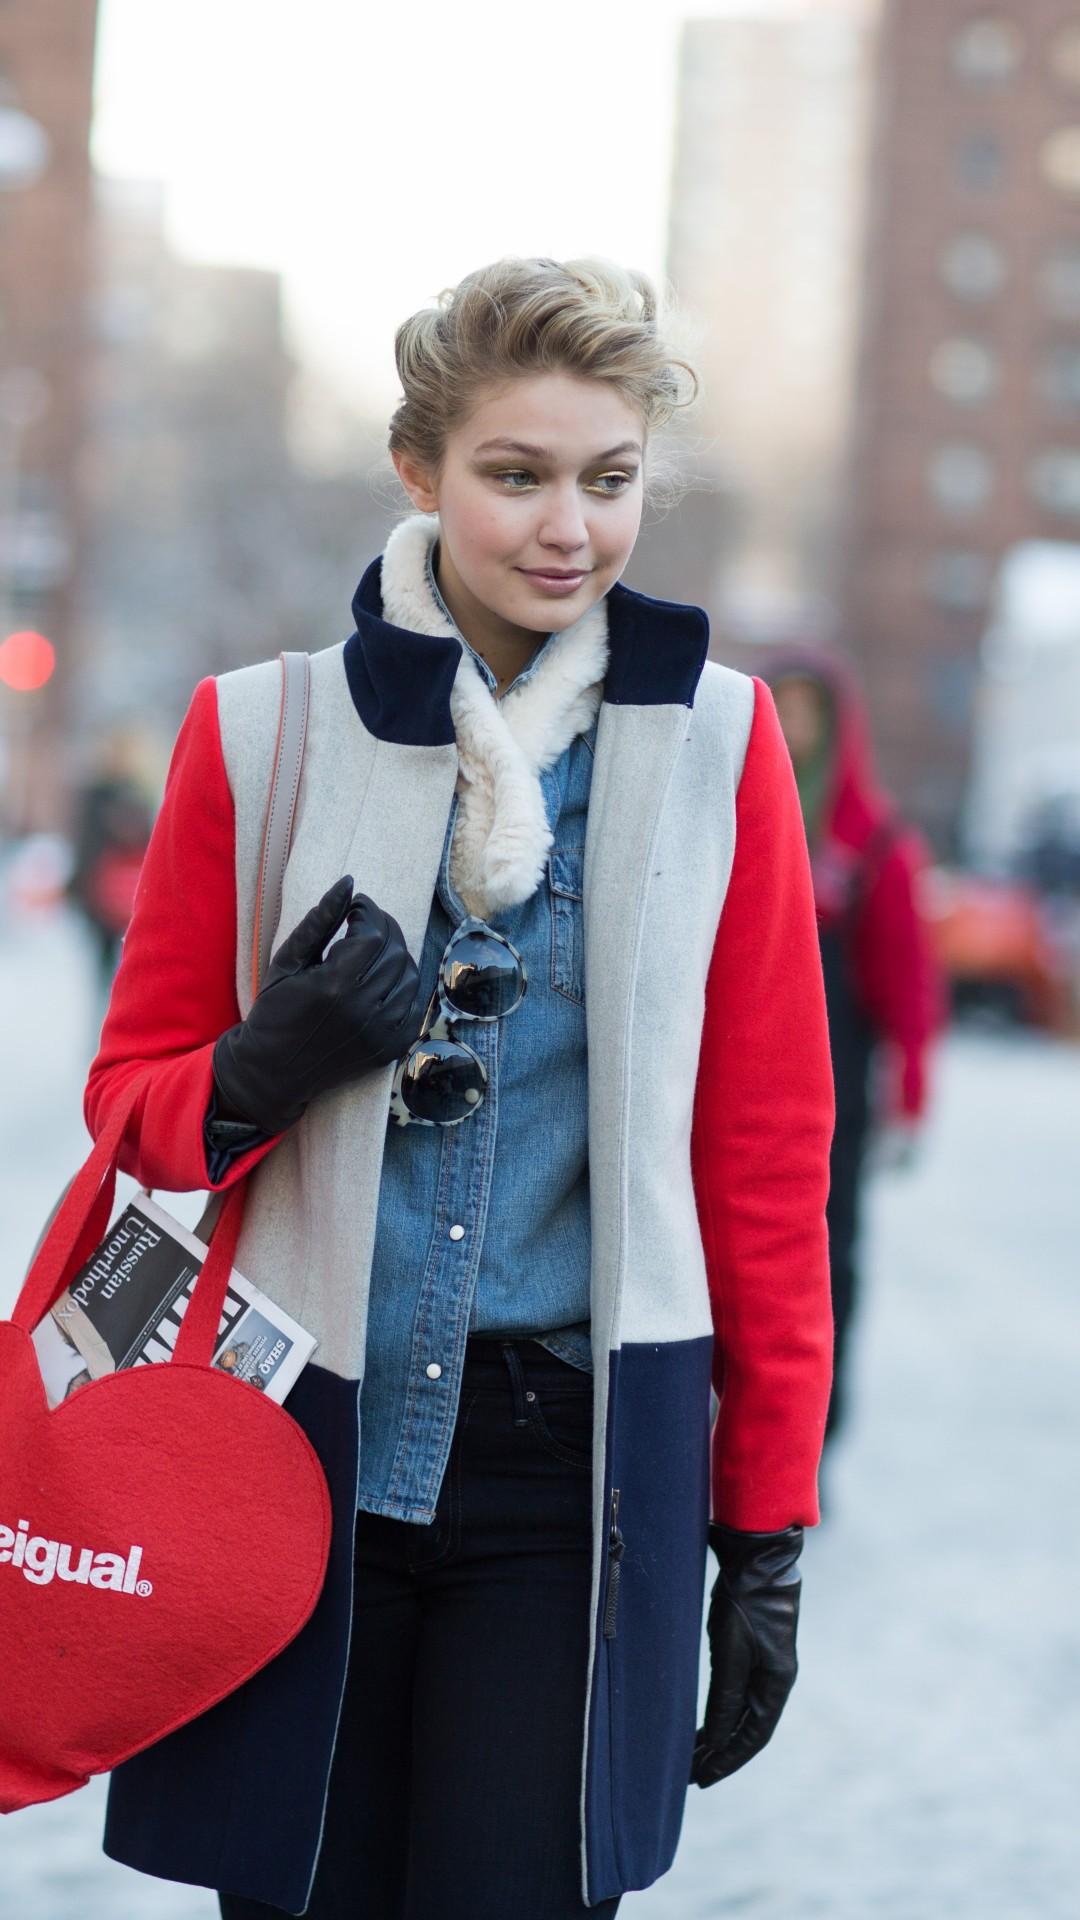 Wallpaper Gigi Hadid, Top Fashion Models 2015, model, TV ...